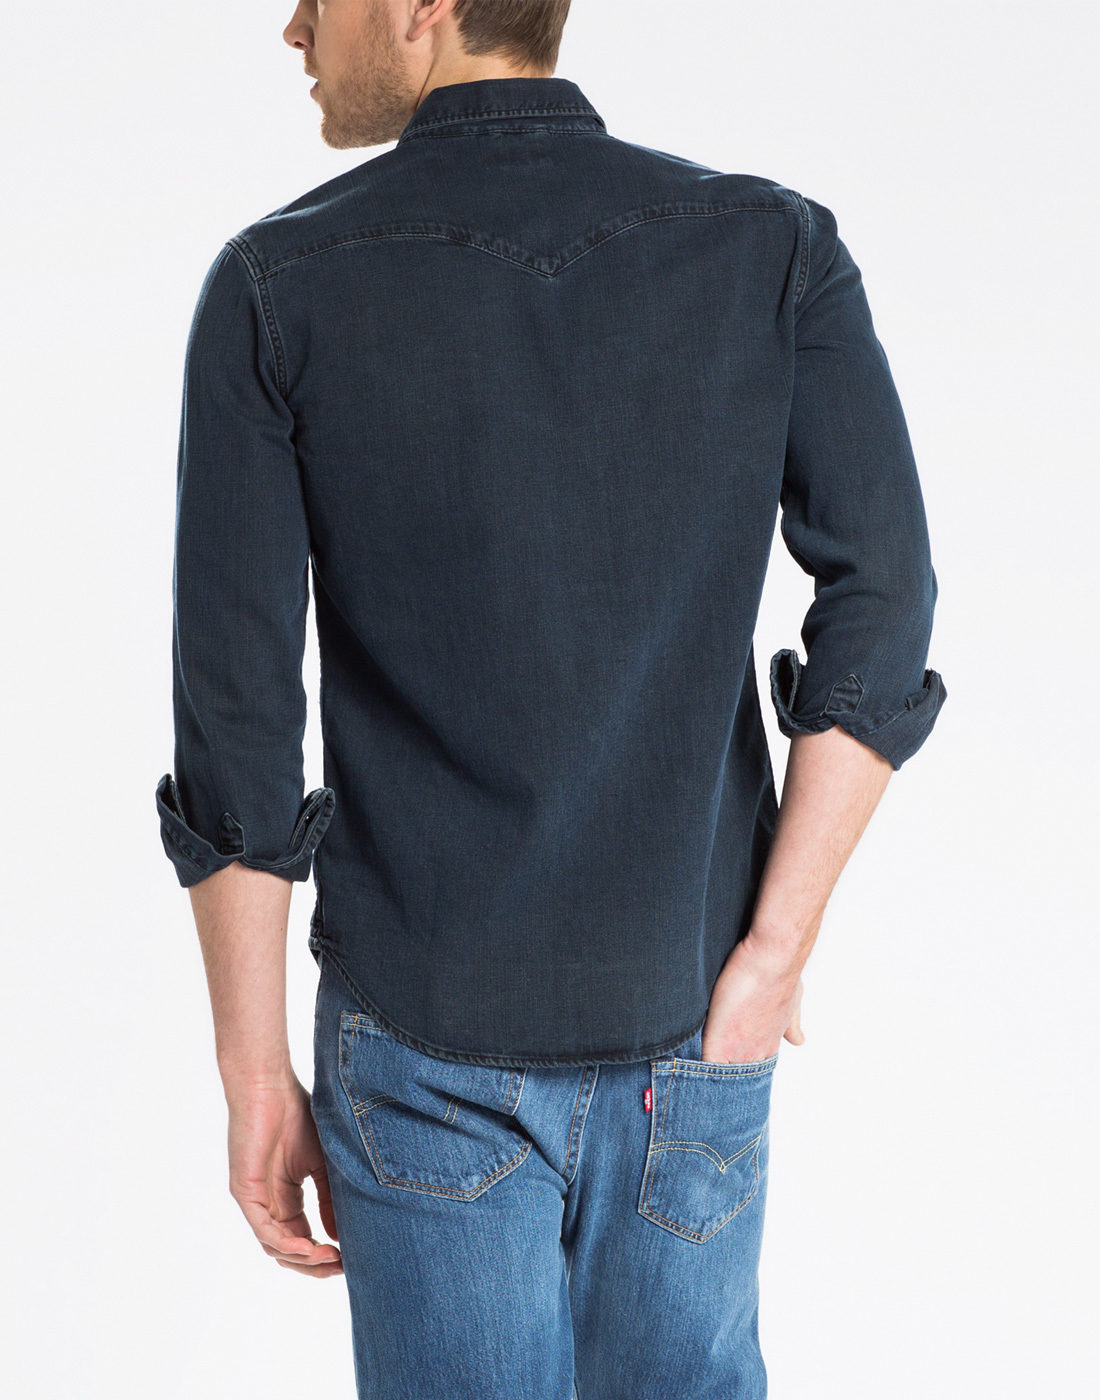 a29d8dd536 LEVI S® Barstow Retro 70s Mens Western Denim Shirt in Smokey Dark